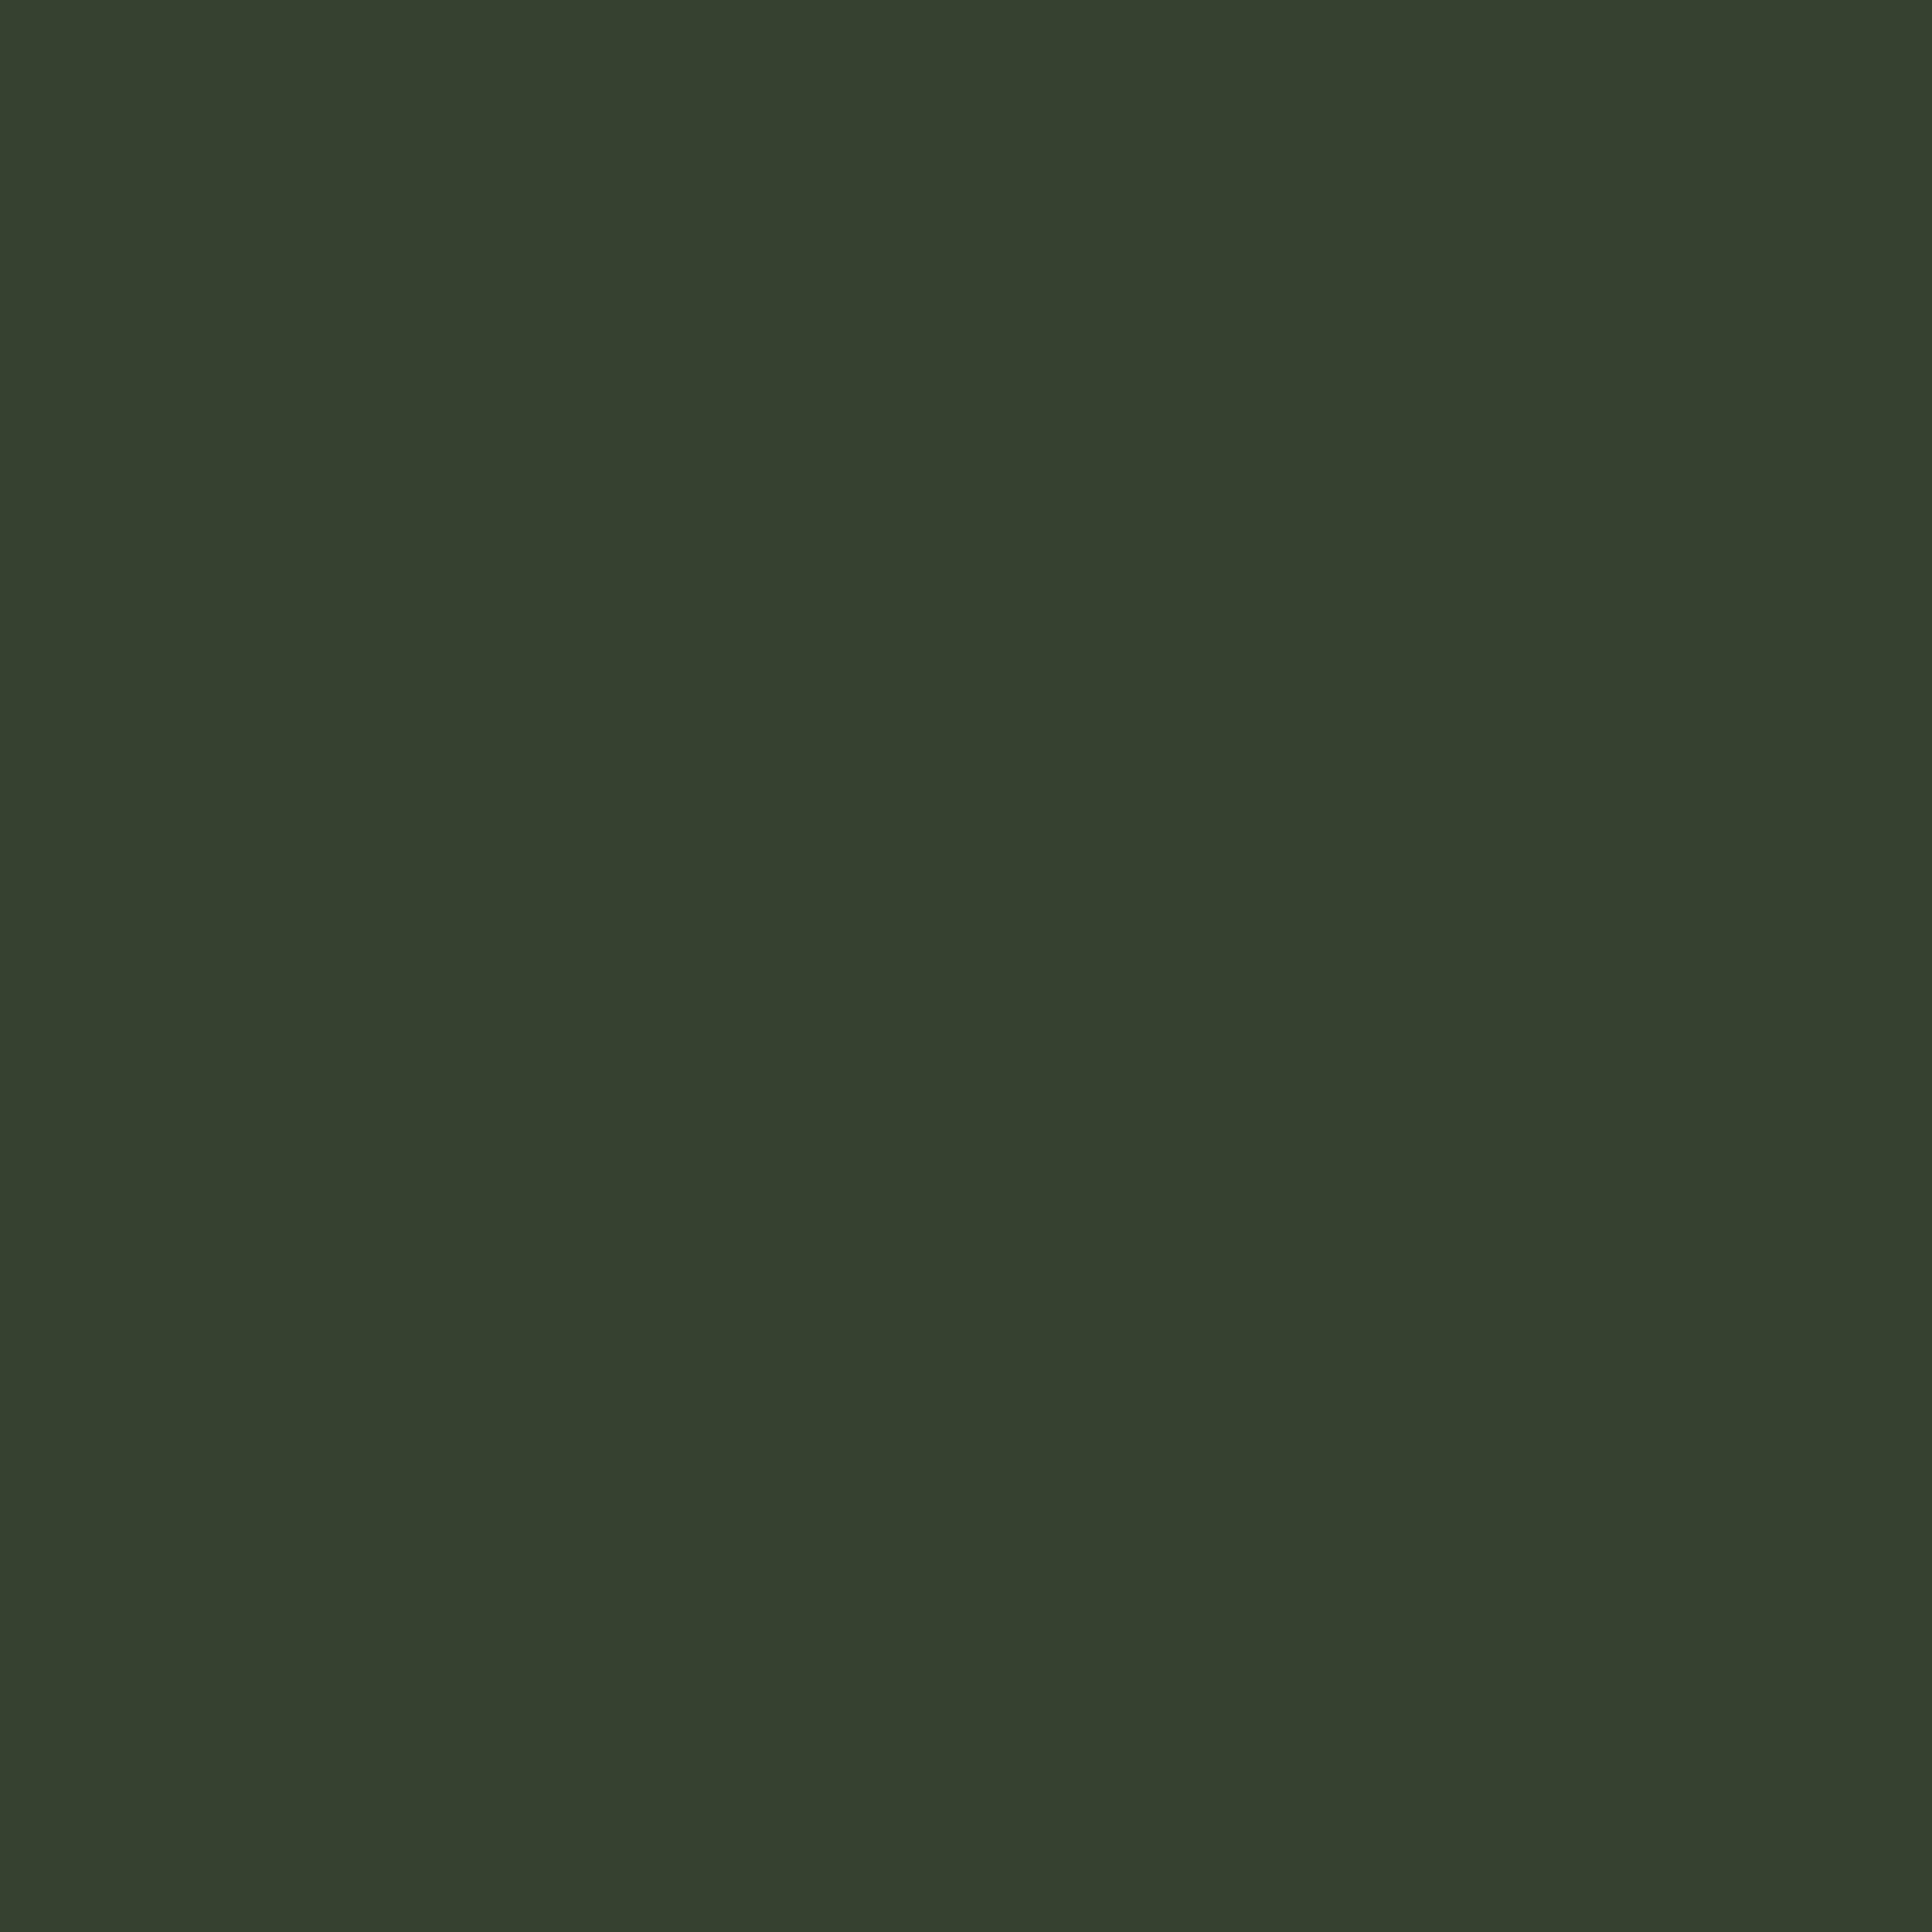 2048x2048 Kombu Green Solid Color Background